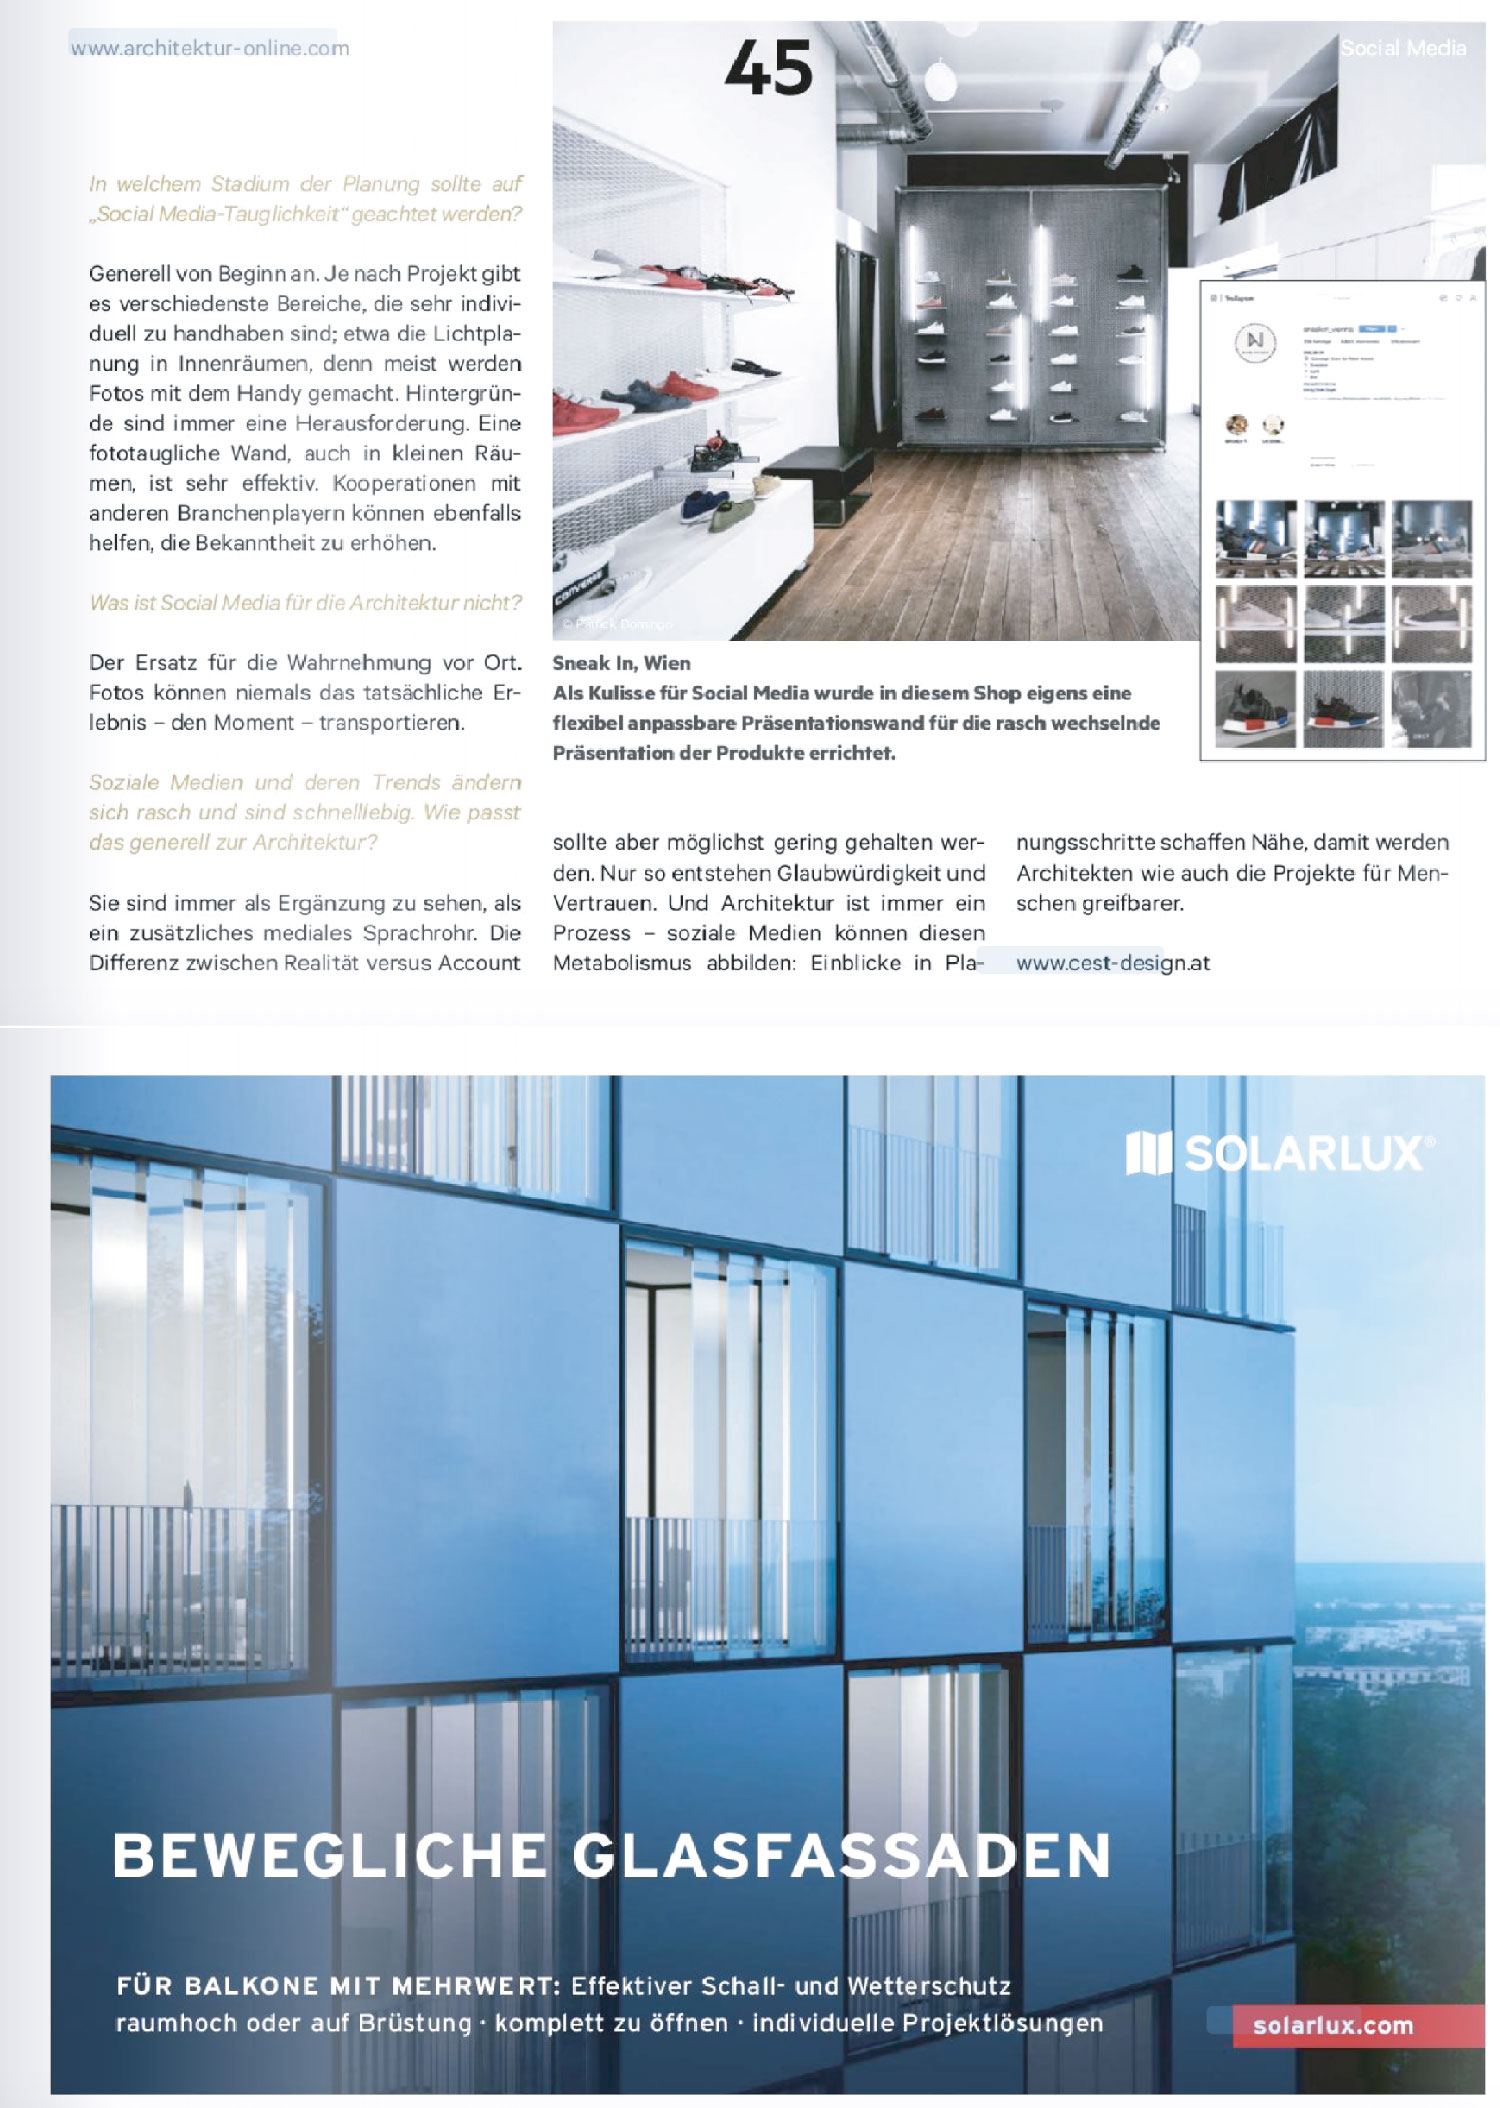 Social Media Architektur - www.cest-design.at